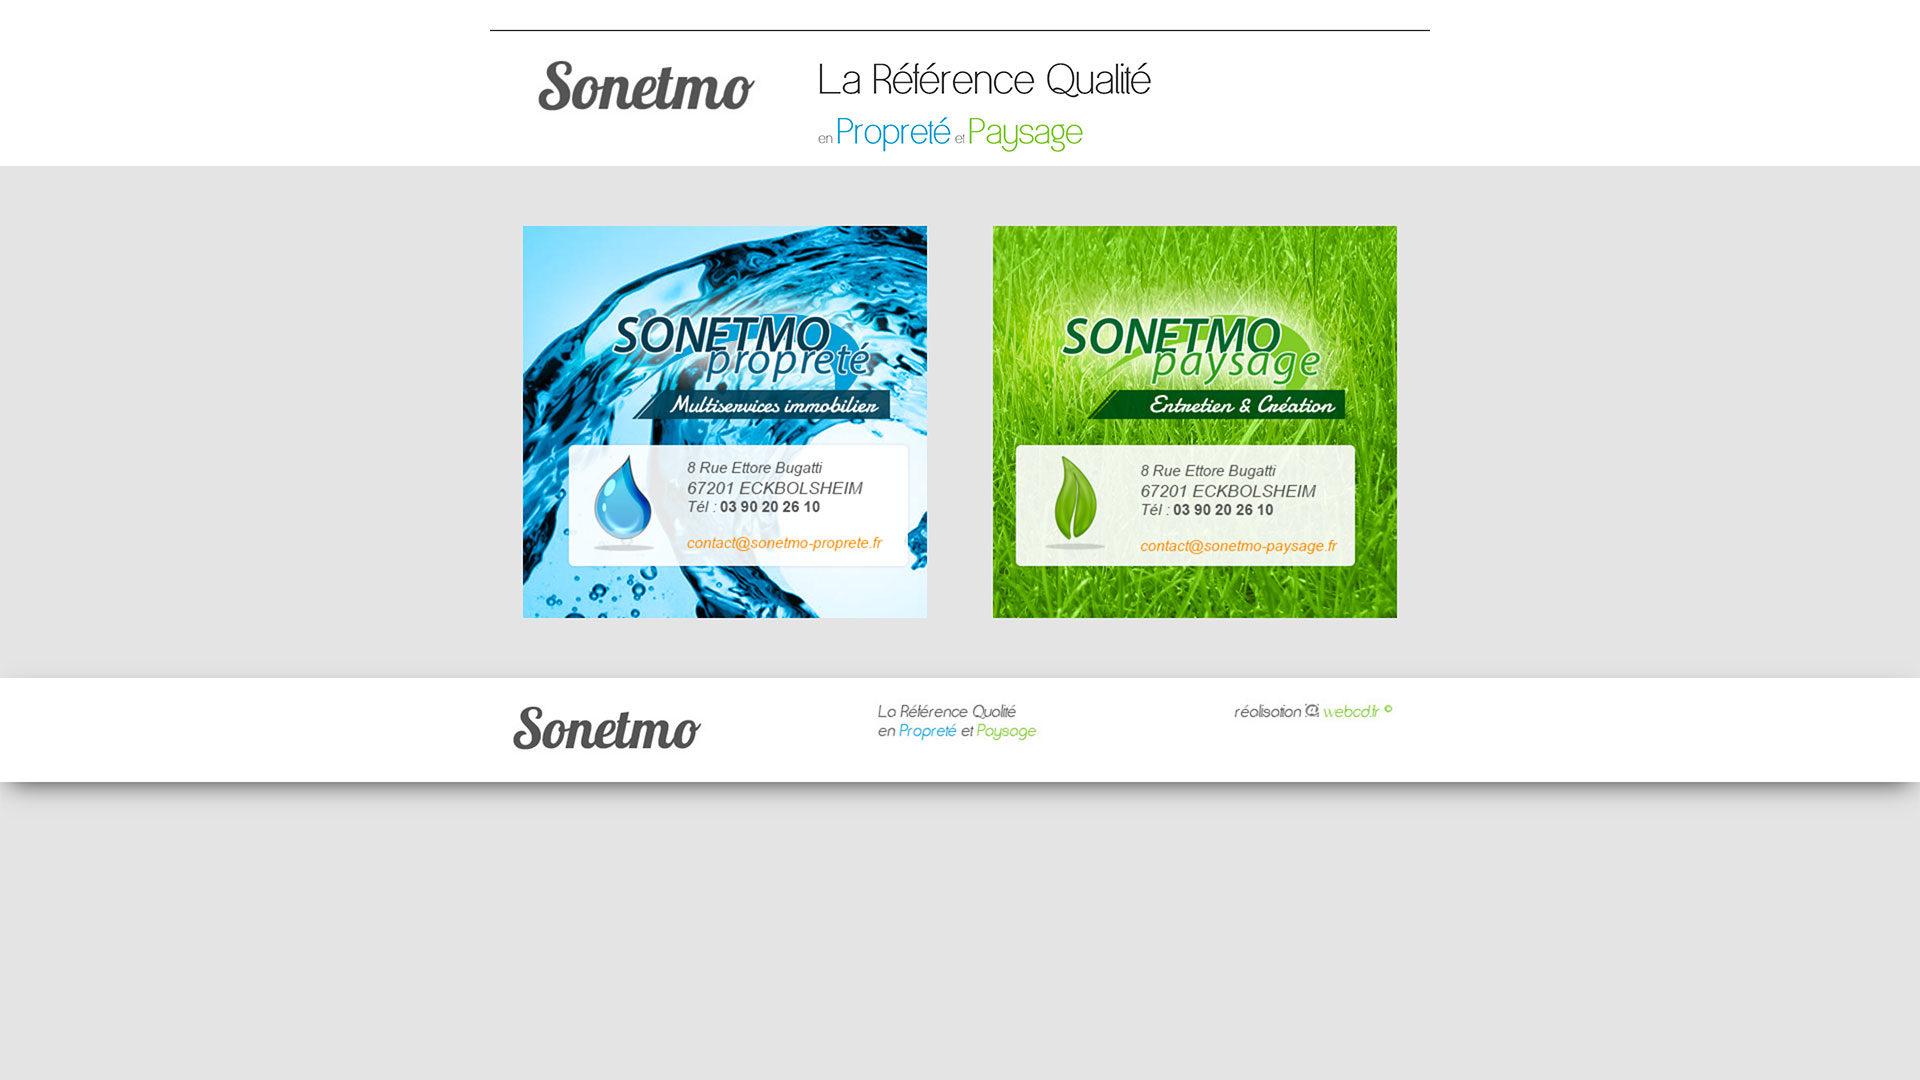 sonetmo.fr